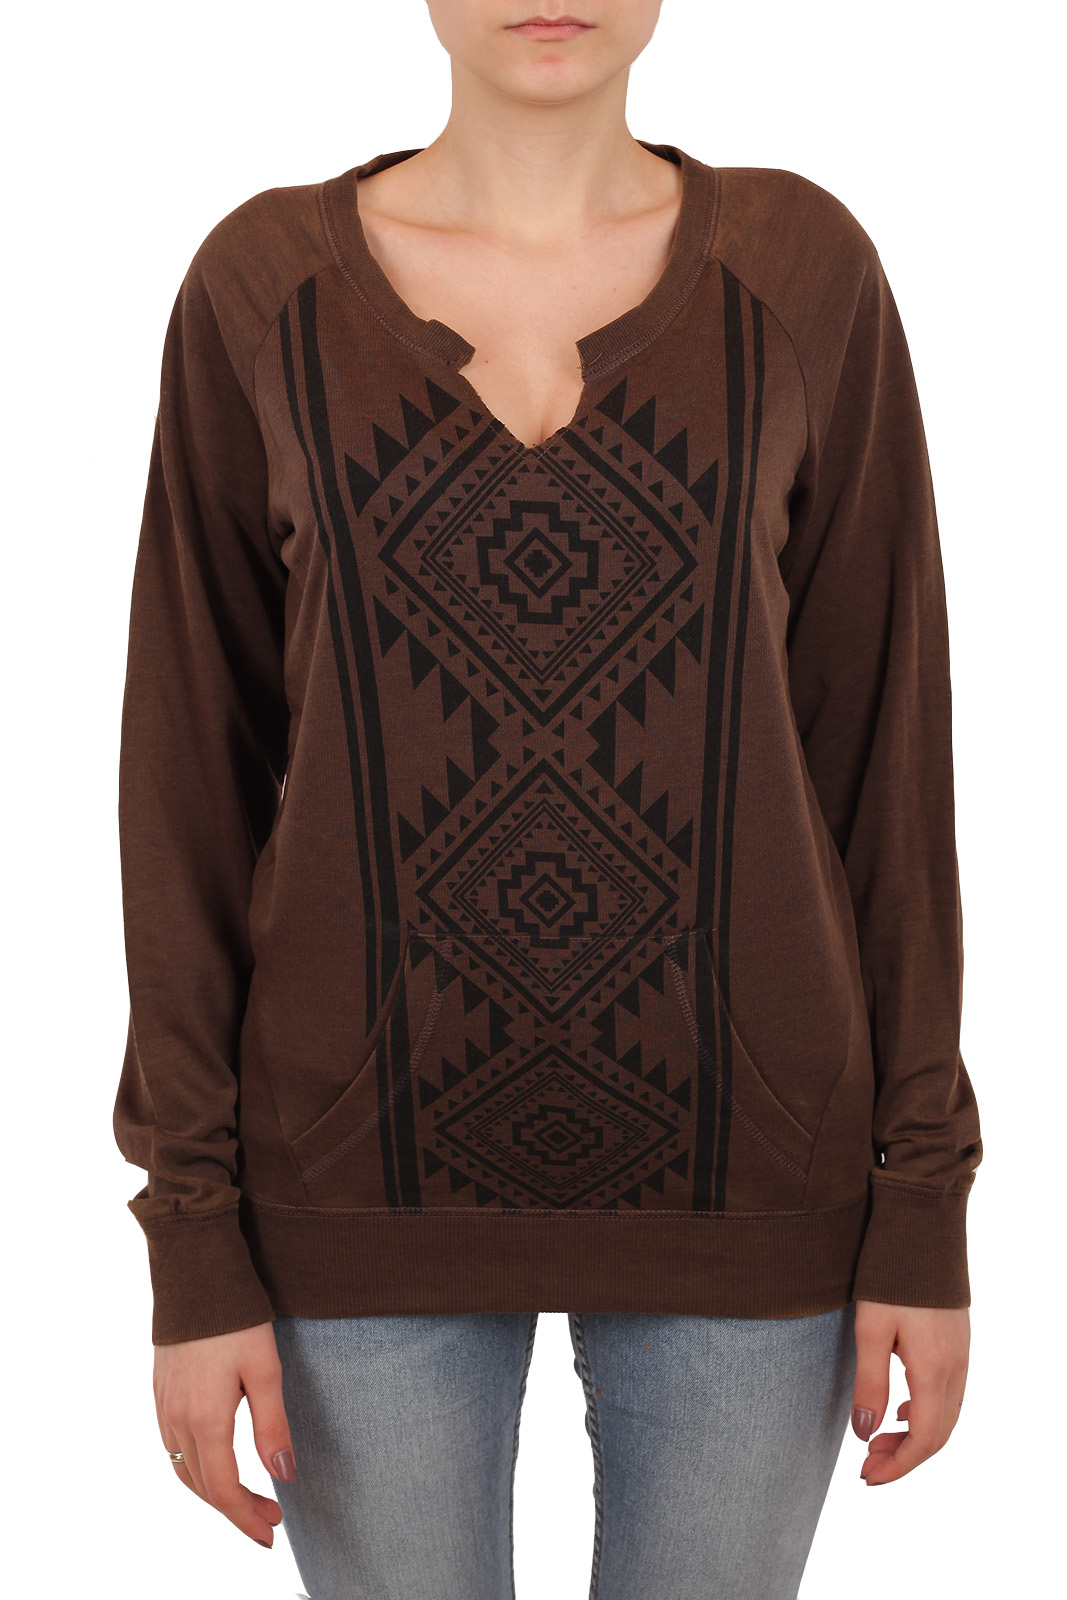 Купить женский свитер кенгуру Rock and Roll Cowgirl